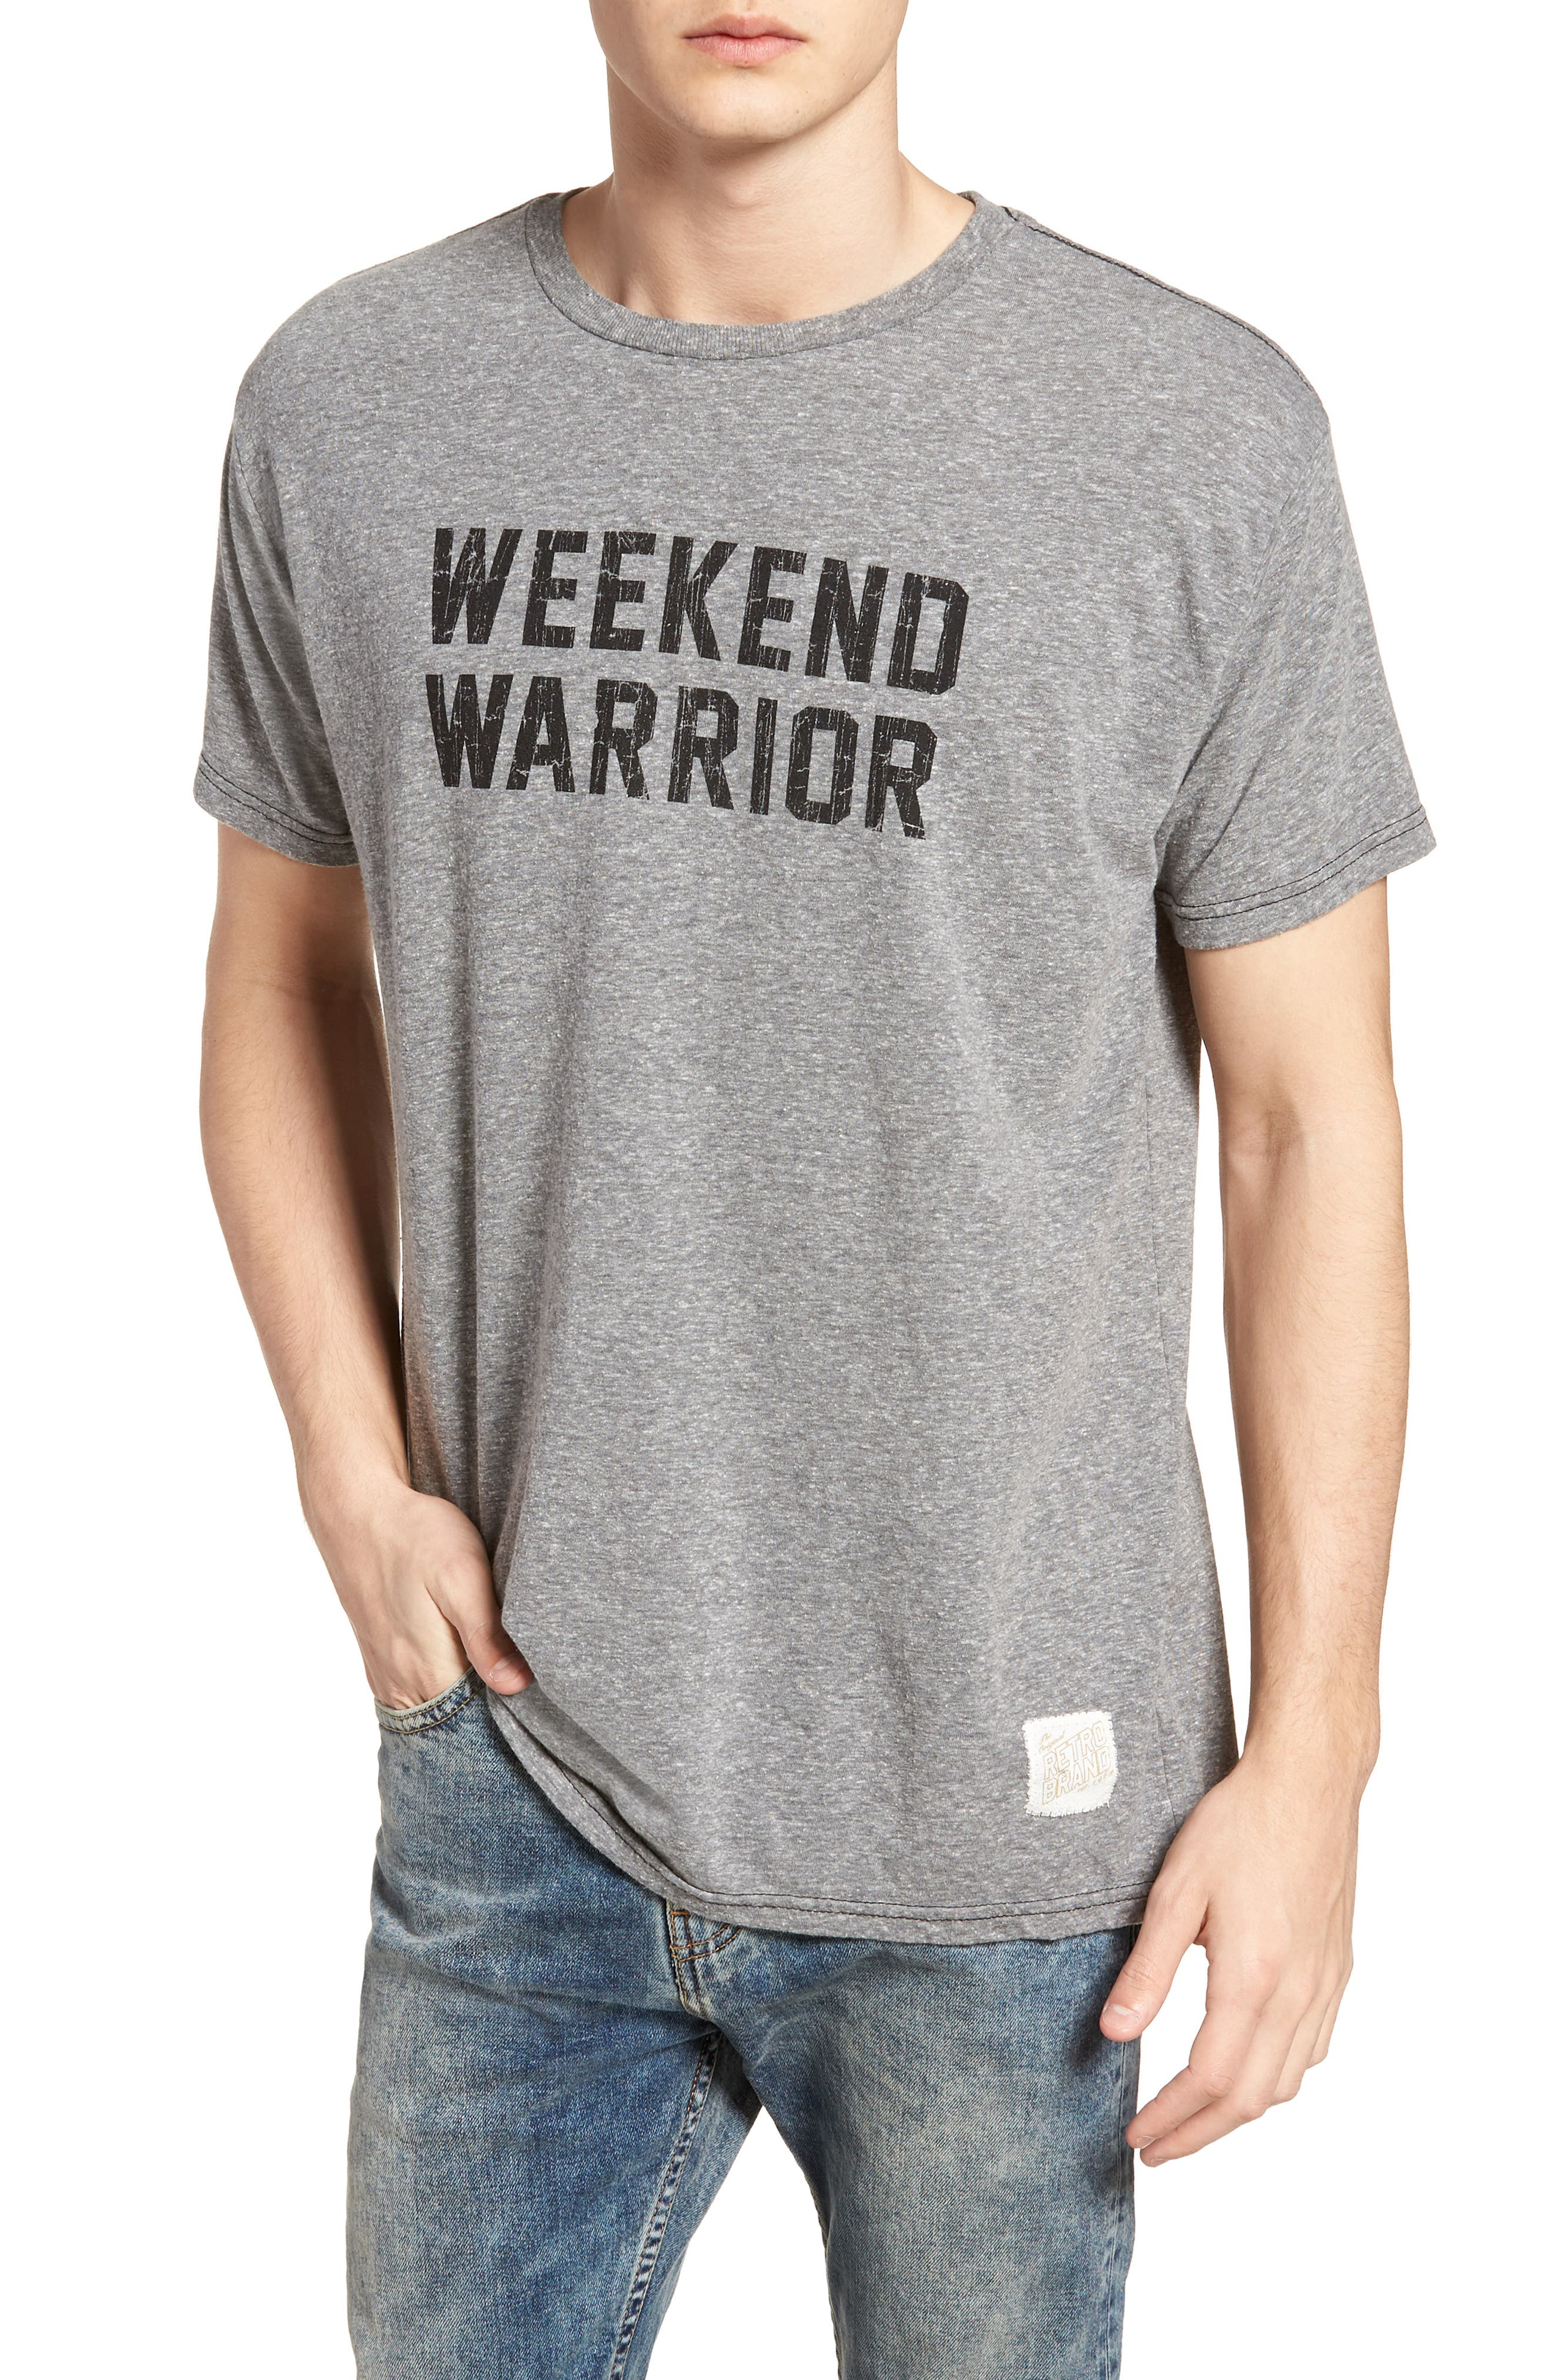 Alternate Image 1 Selected - Retro Brand Weekend Warrior T-Shirt